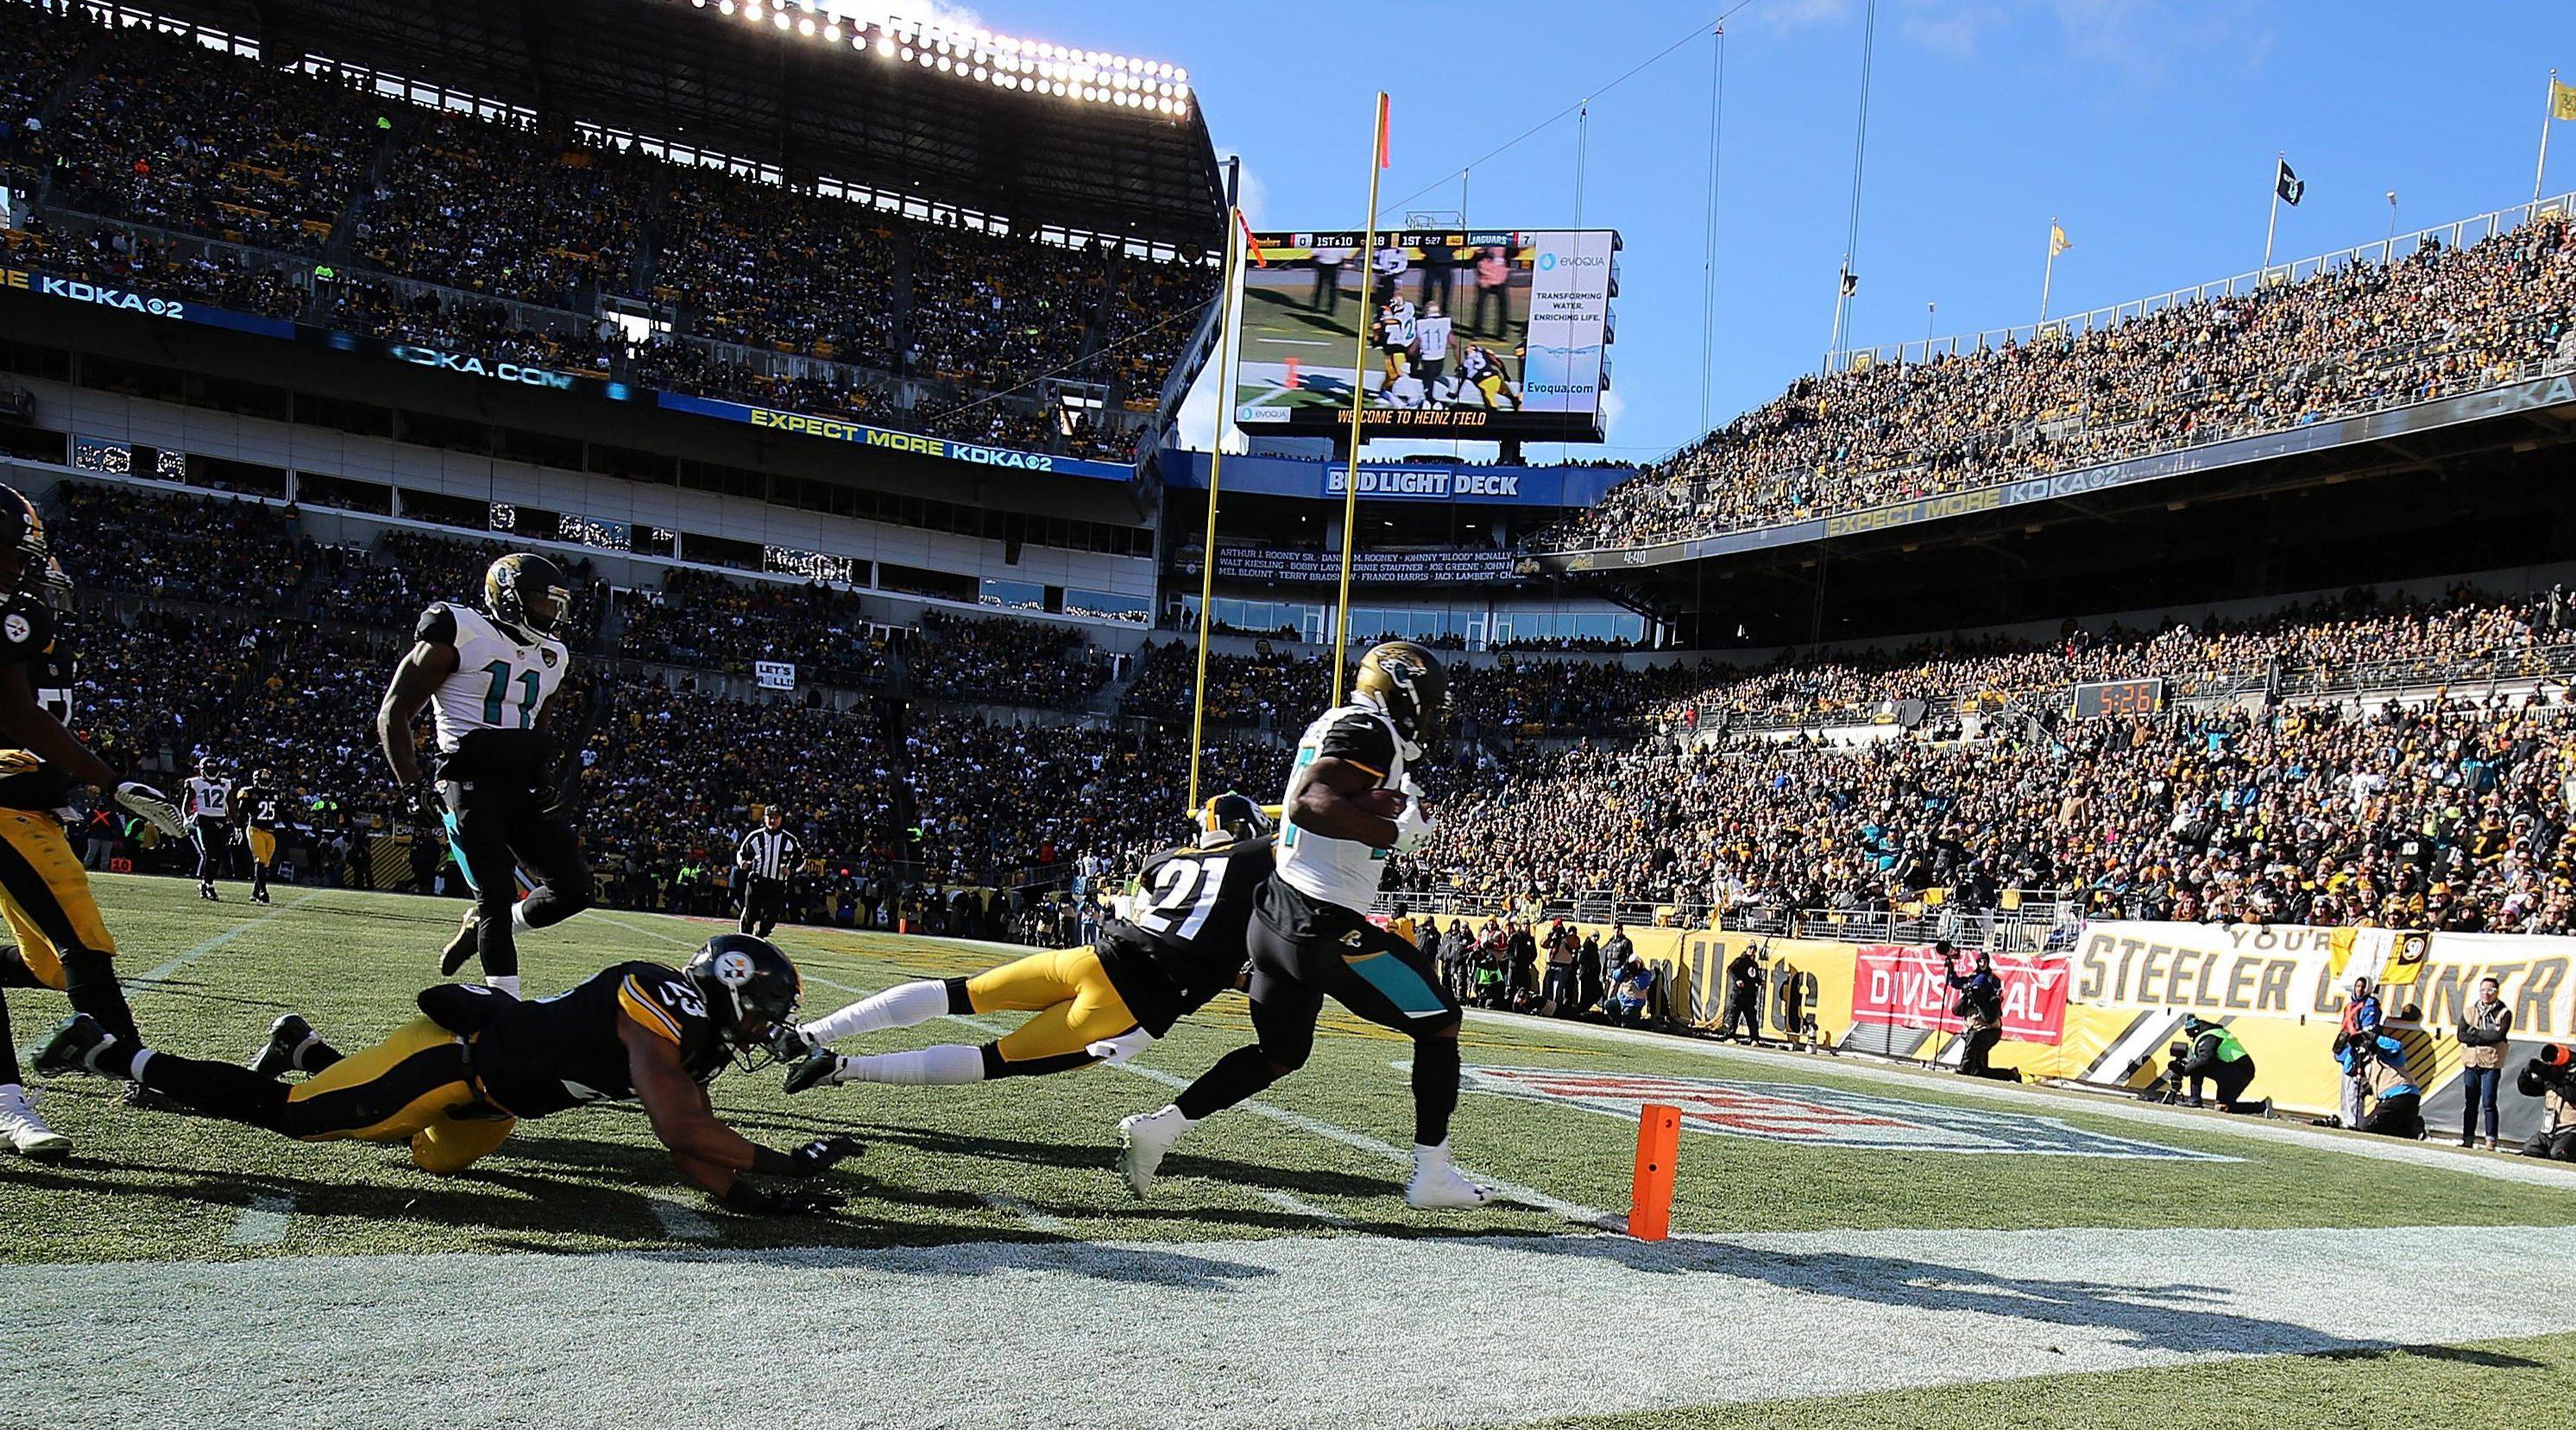 Leonard Fournette runs over for a touchdown in Jacksonville's win over Pittsburgh